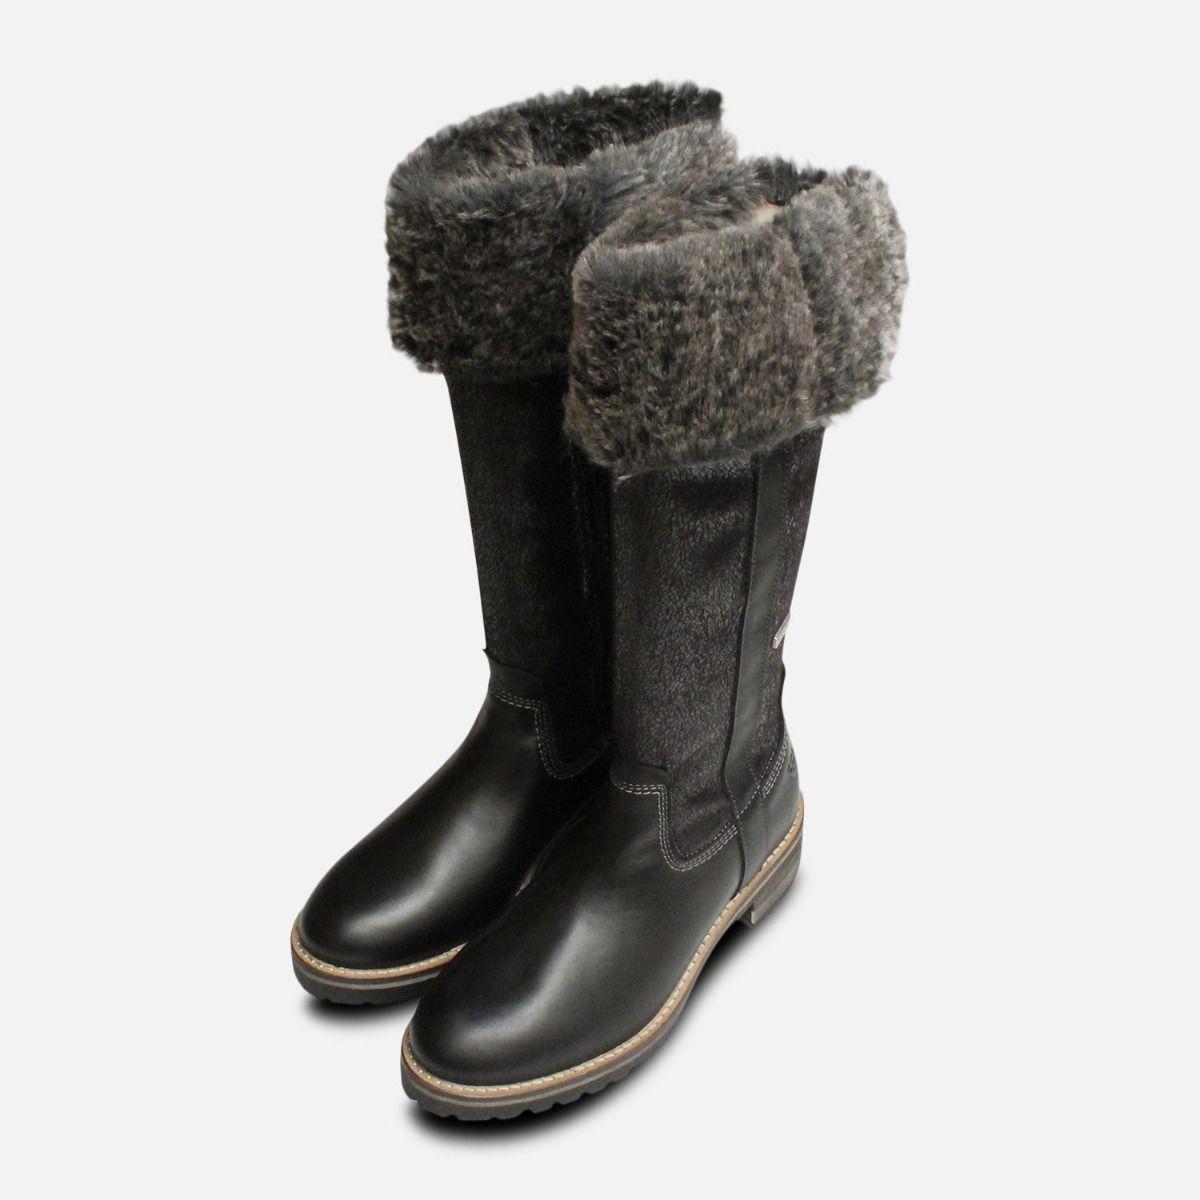 Black Warm Fur Lined Tamaris Long Boots